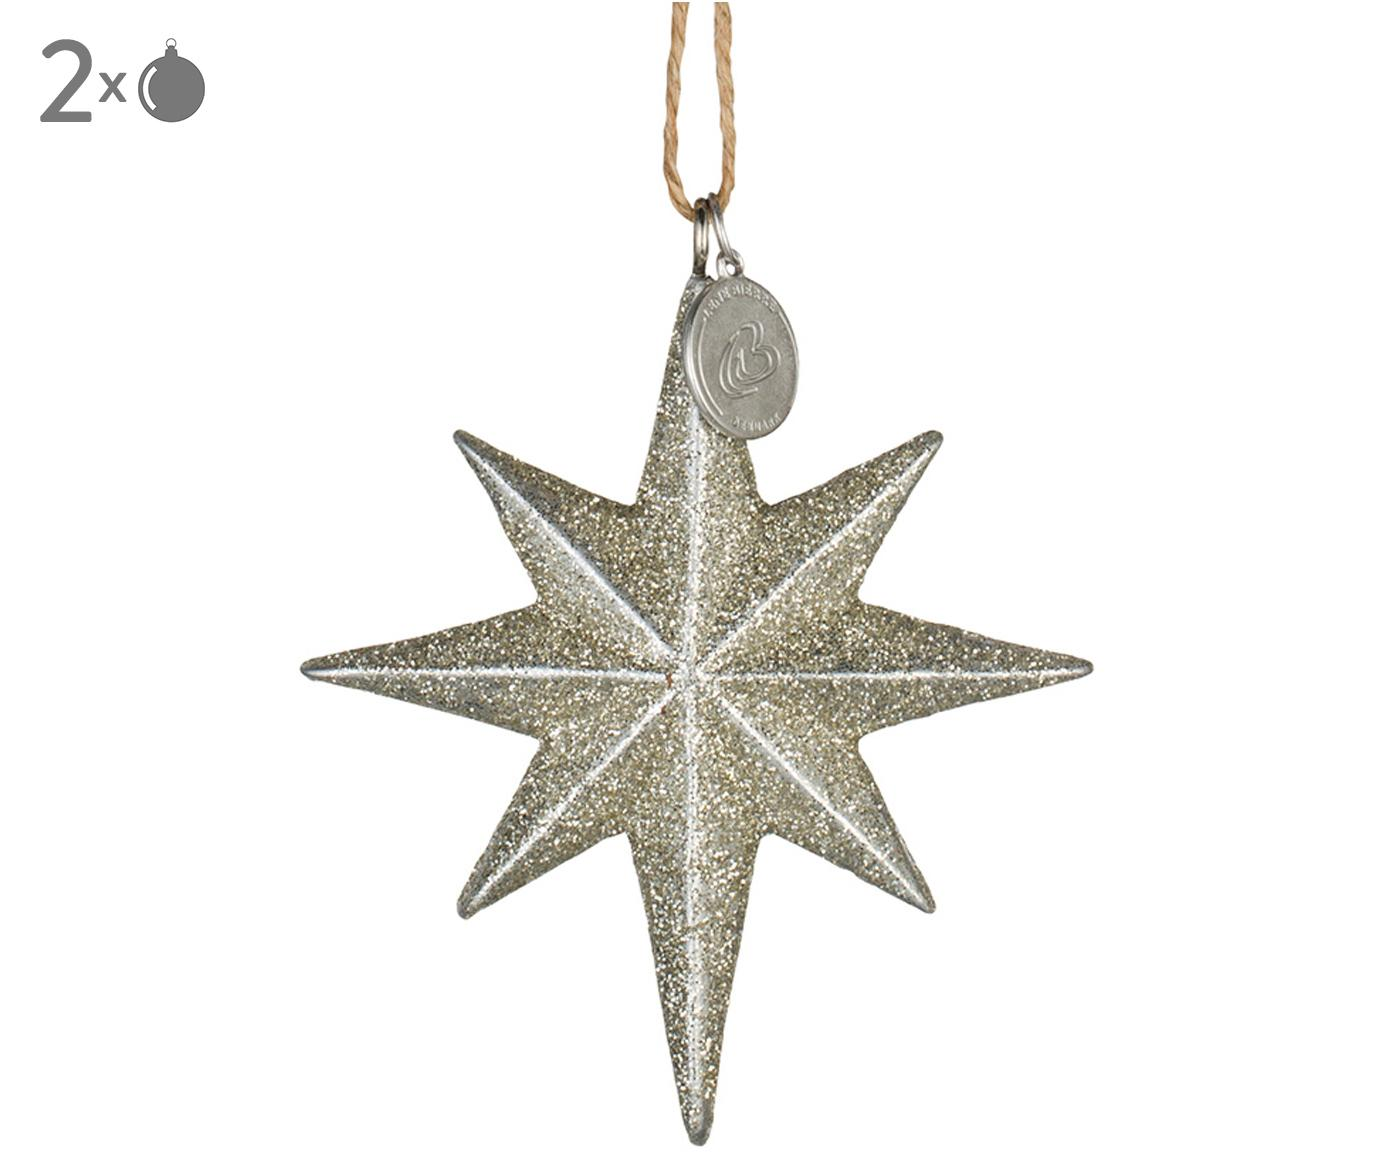 Adornos navideños Serafina Star, 2uds., Dorado, An 7 x Al 8 cm